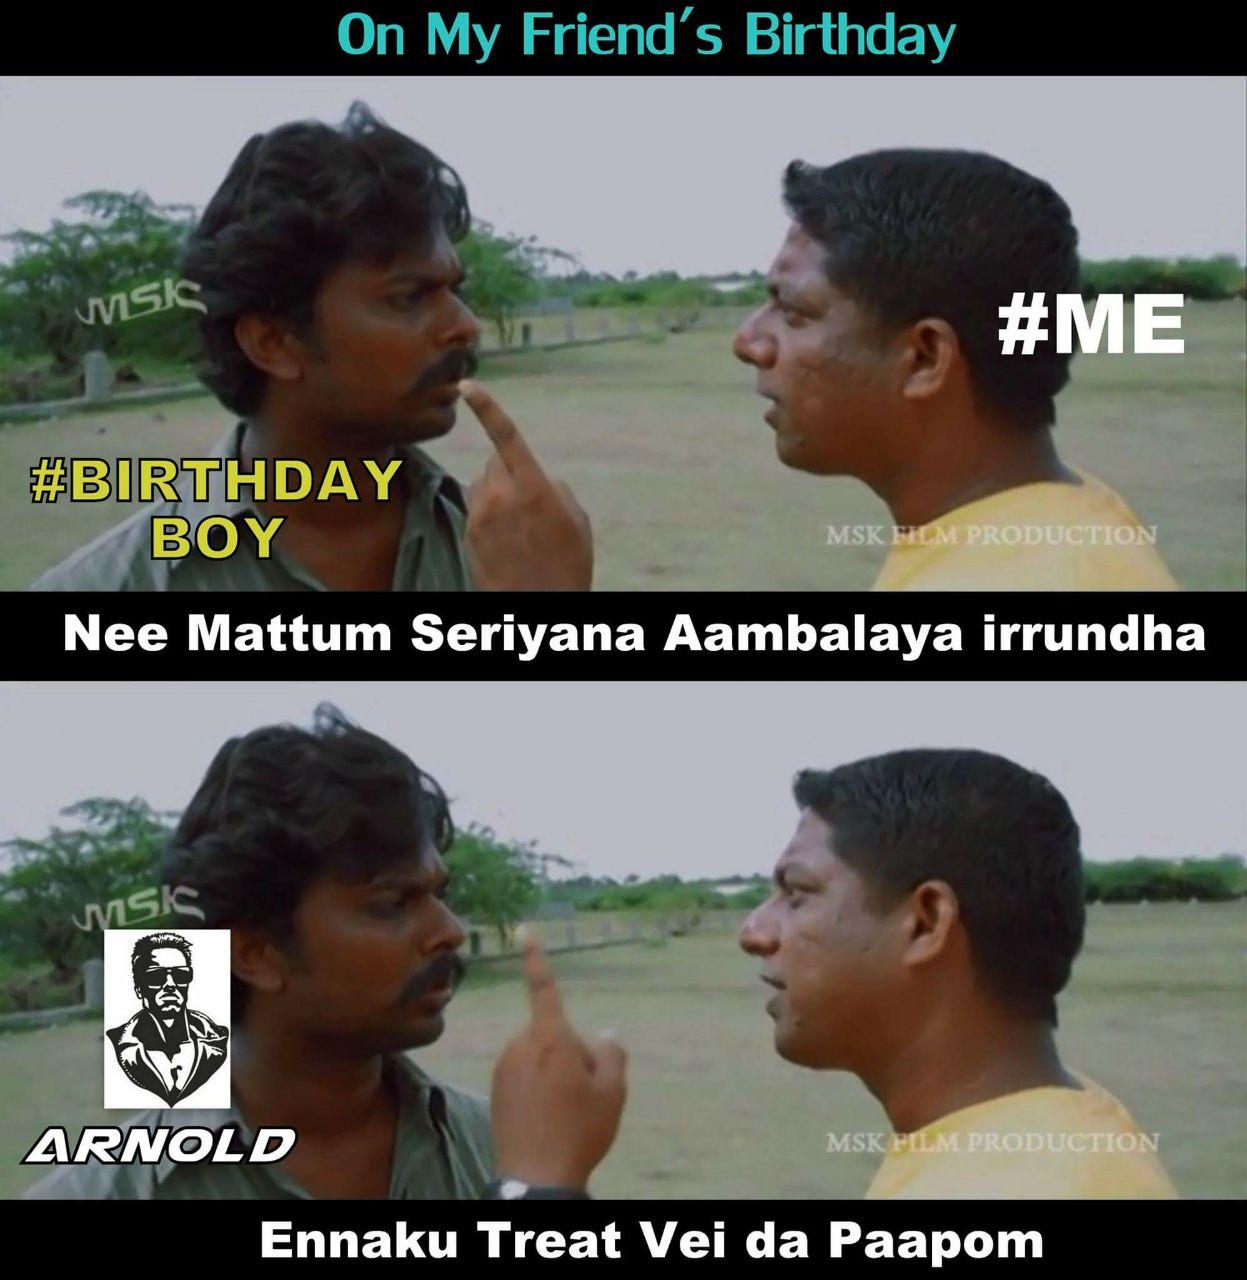 Best Tamil Meme Collections Aambalaya Irrundha Treat Vei Da